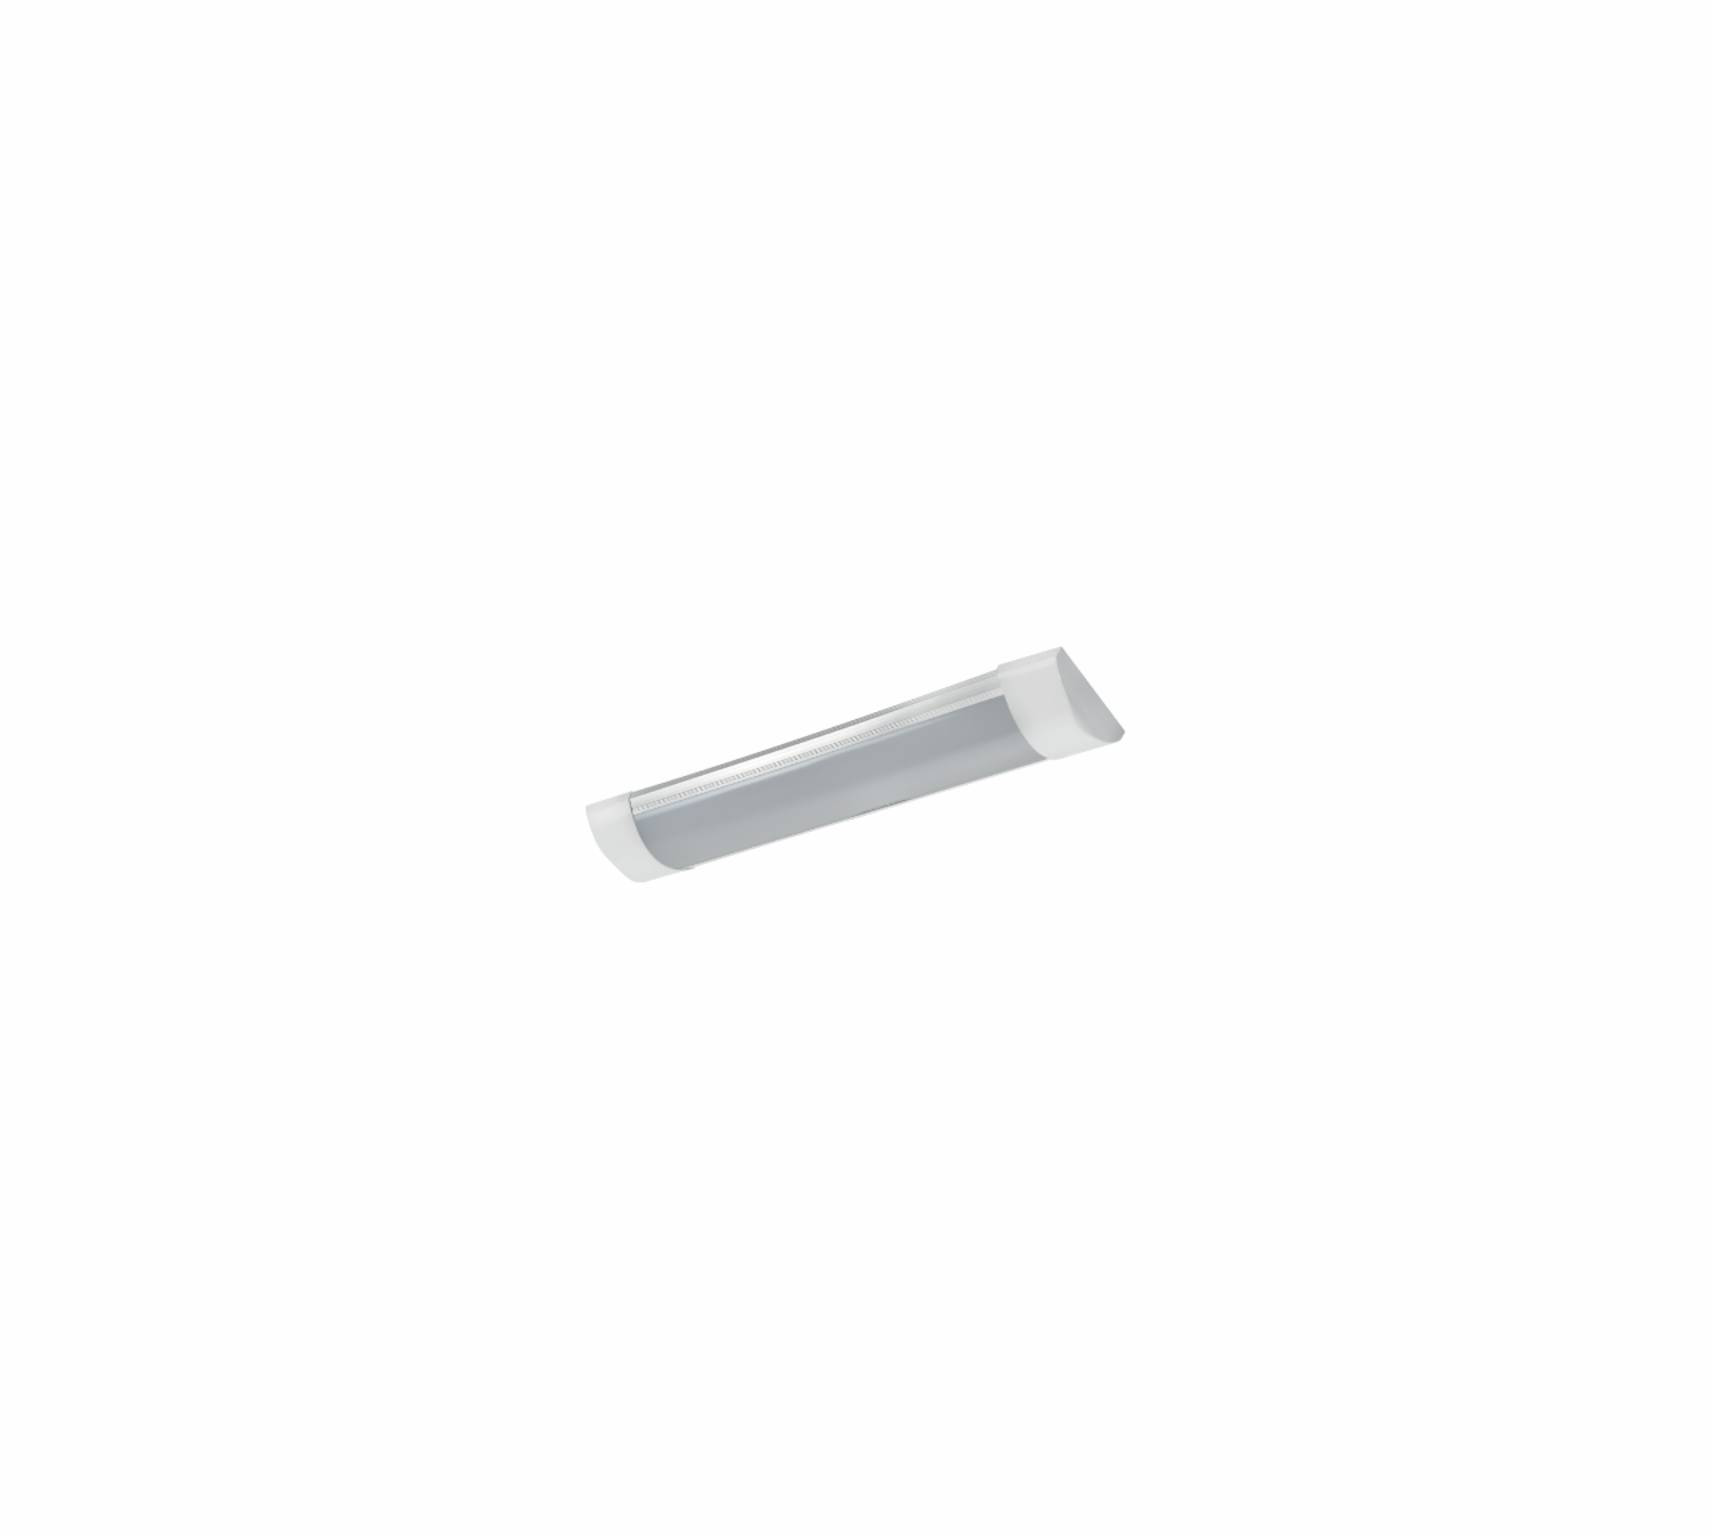 FLATSLIM-LED-9-120S-65-3C <span>(caixa)</span><br/>